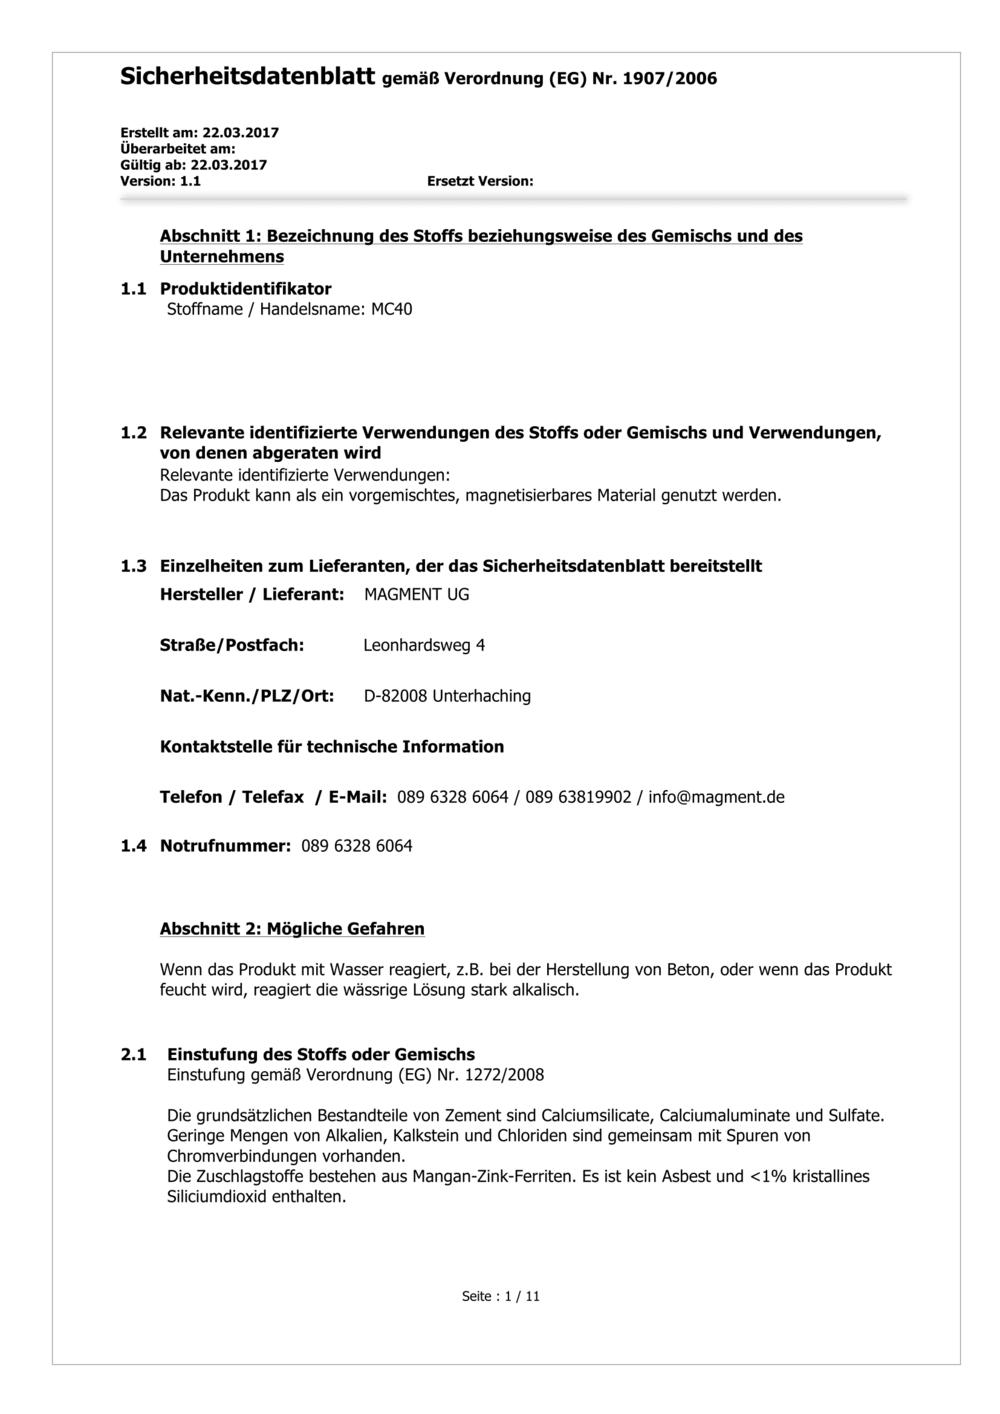 MSDB_MC40-01.png